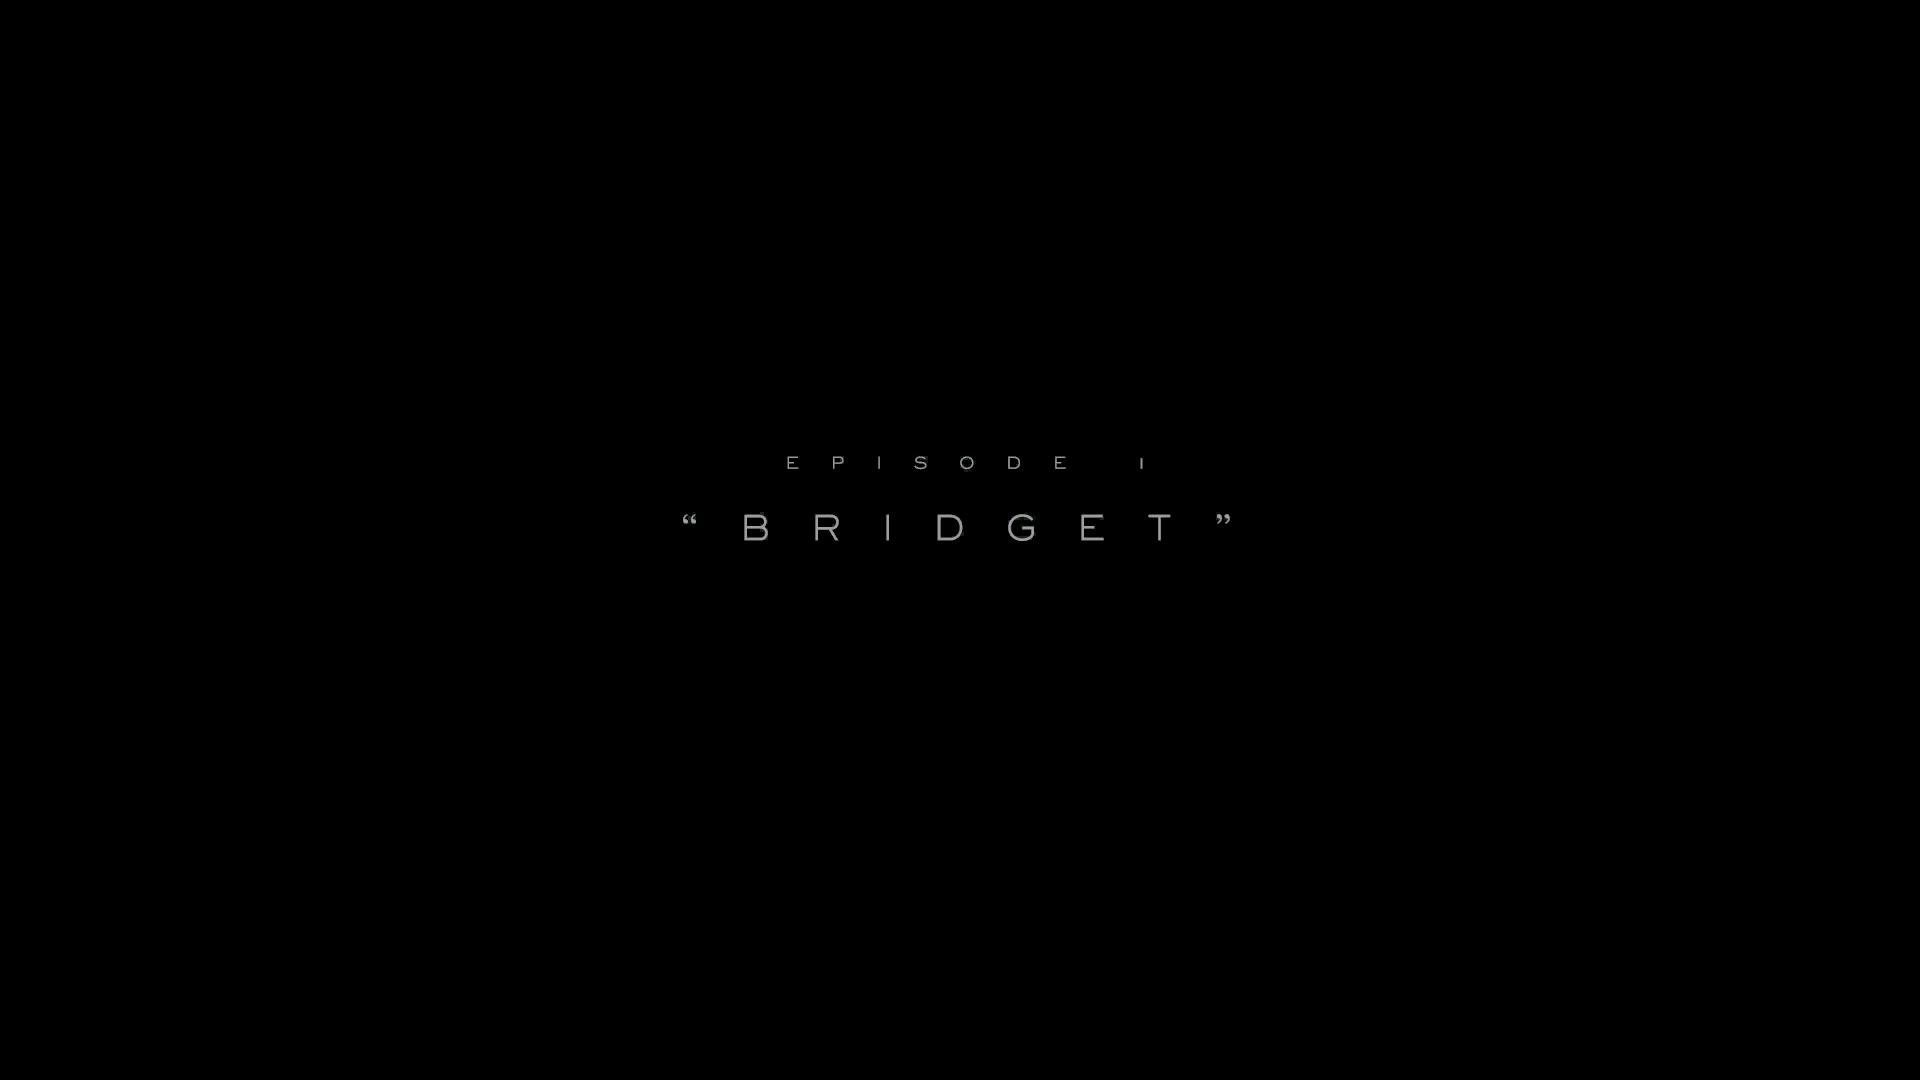 Episode 1: Bridget